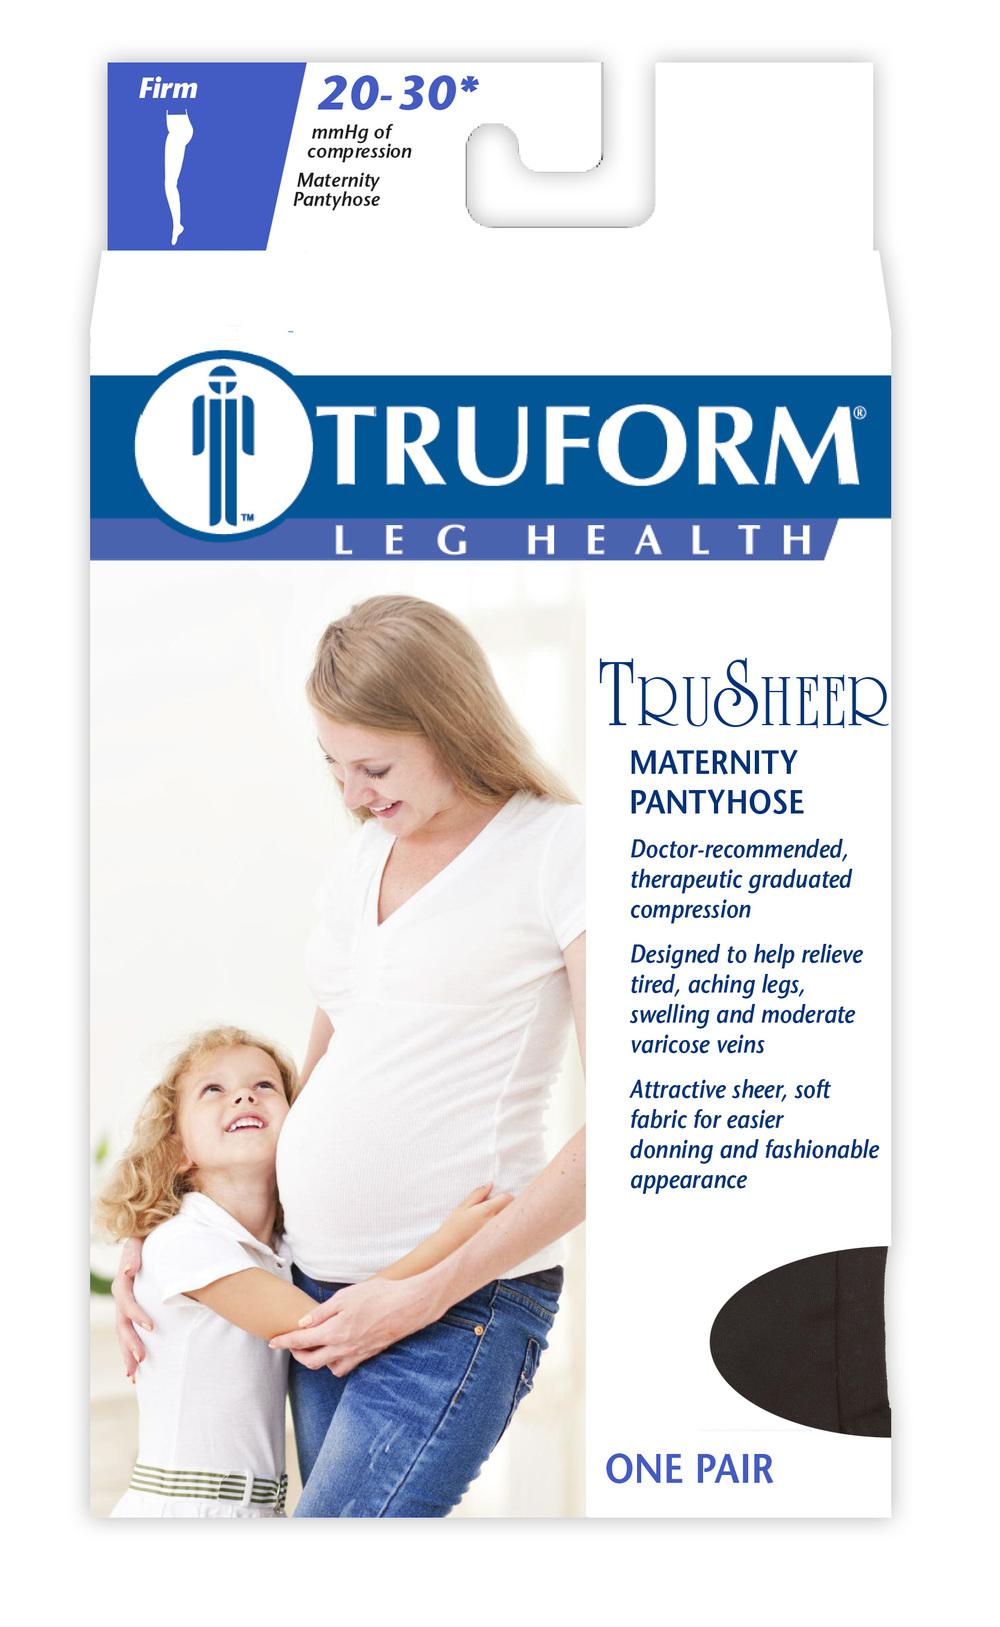 Truform, 0267, 20-30 mmHg, TRUSheer, Maternity Style, Pantyhose, Package